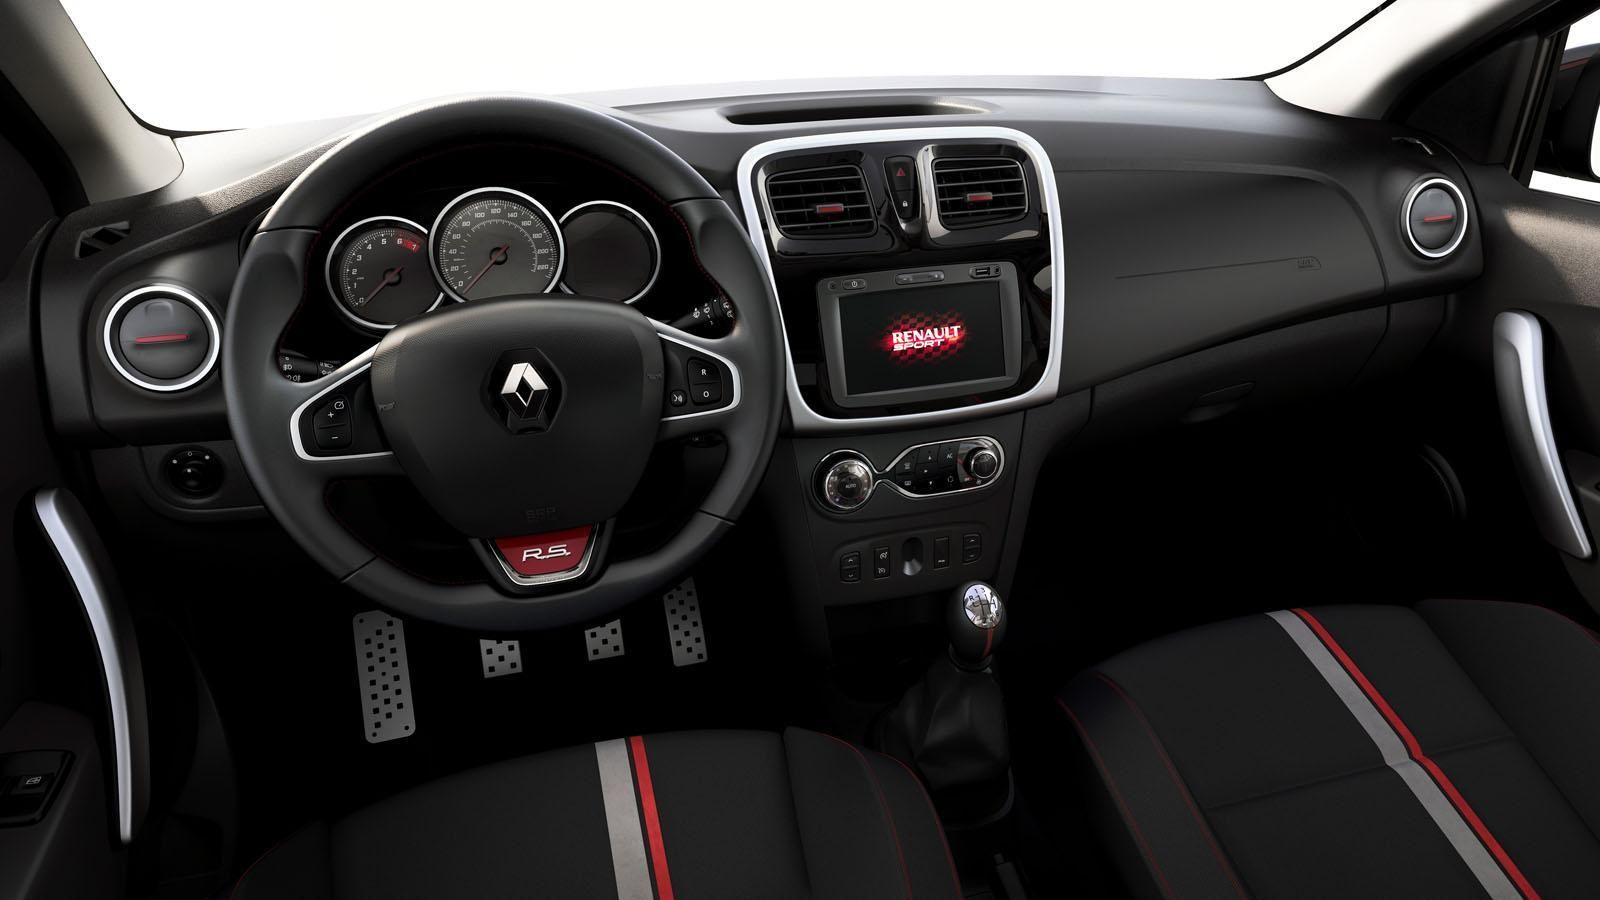 Foto de Renault Sandero R.S 2.0 (7/8)